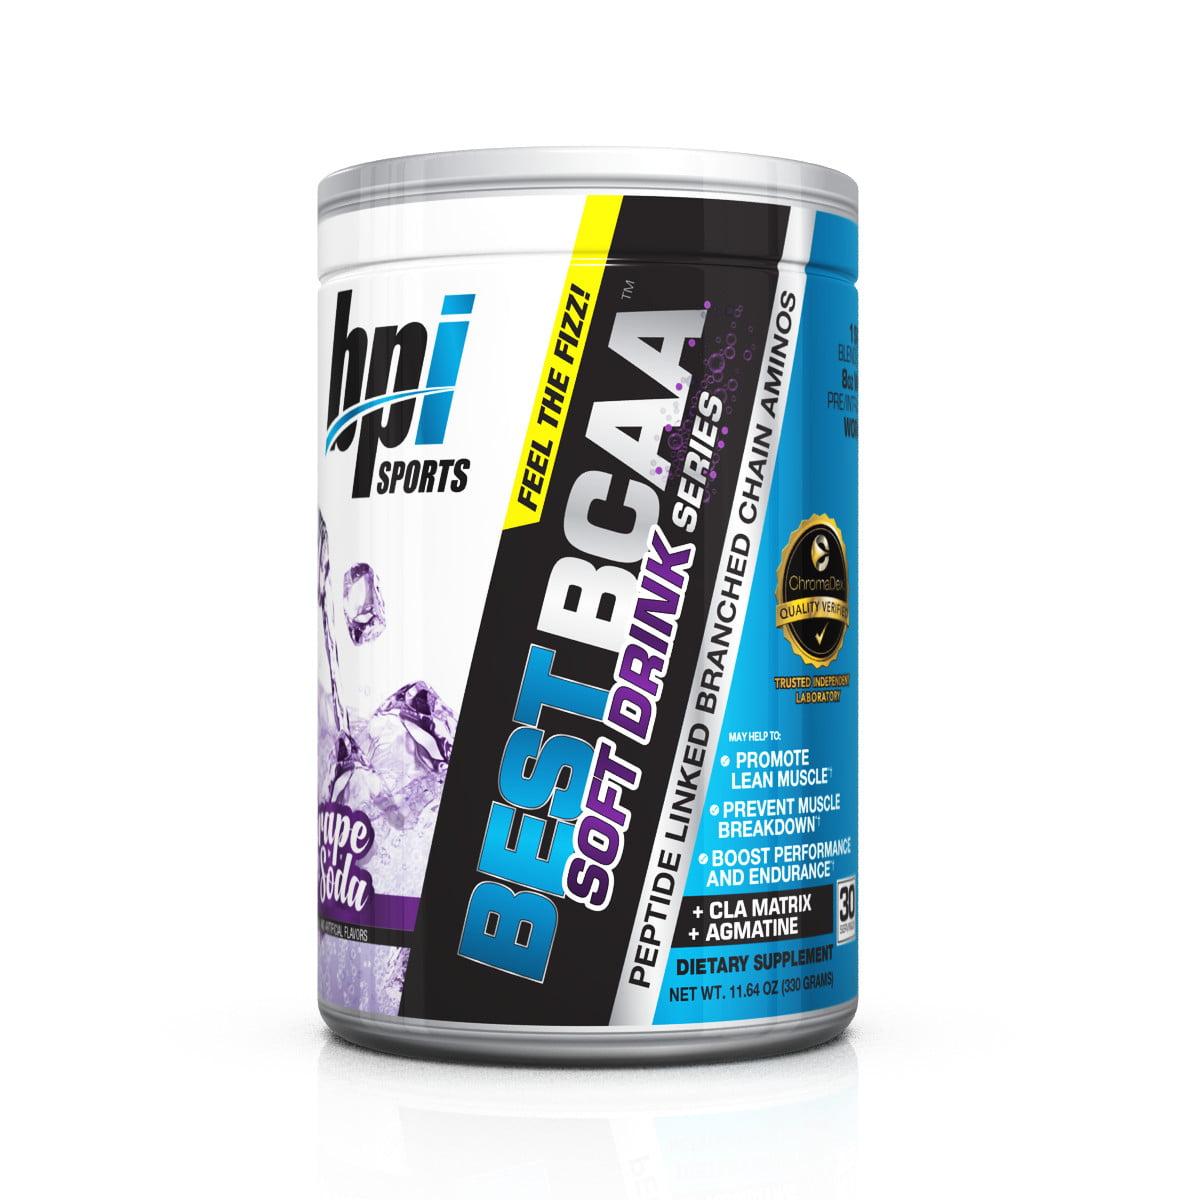 BPI Sports Best BCAA Soft Drink Series, Amino Grape, 30 Servings